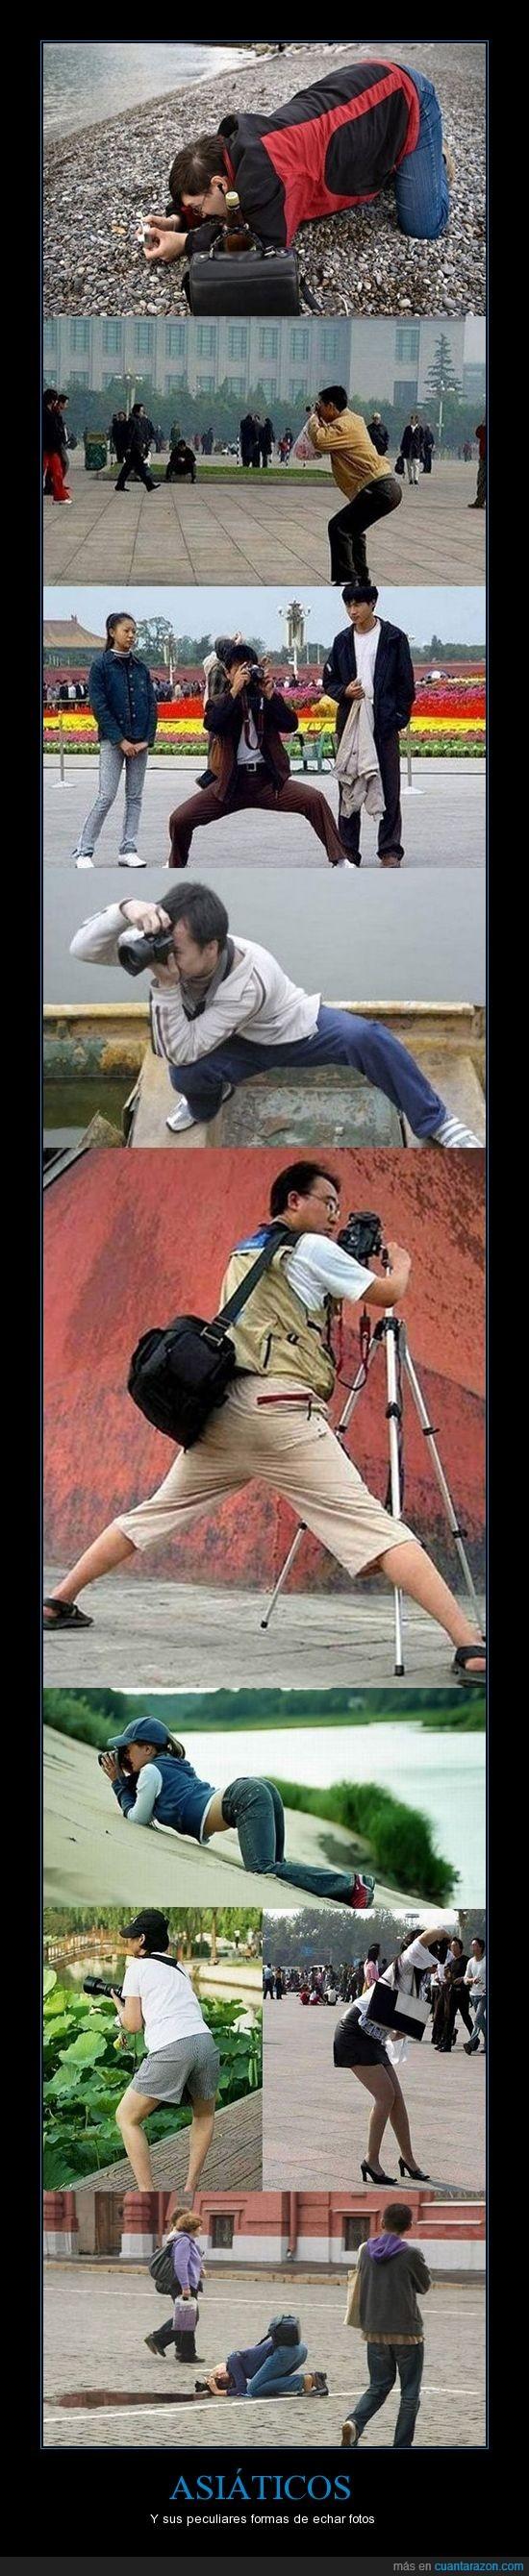 asia,china,chinito,corea,curiosidades,fotos,japon,sacar fotos a lo ninja